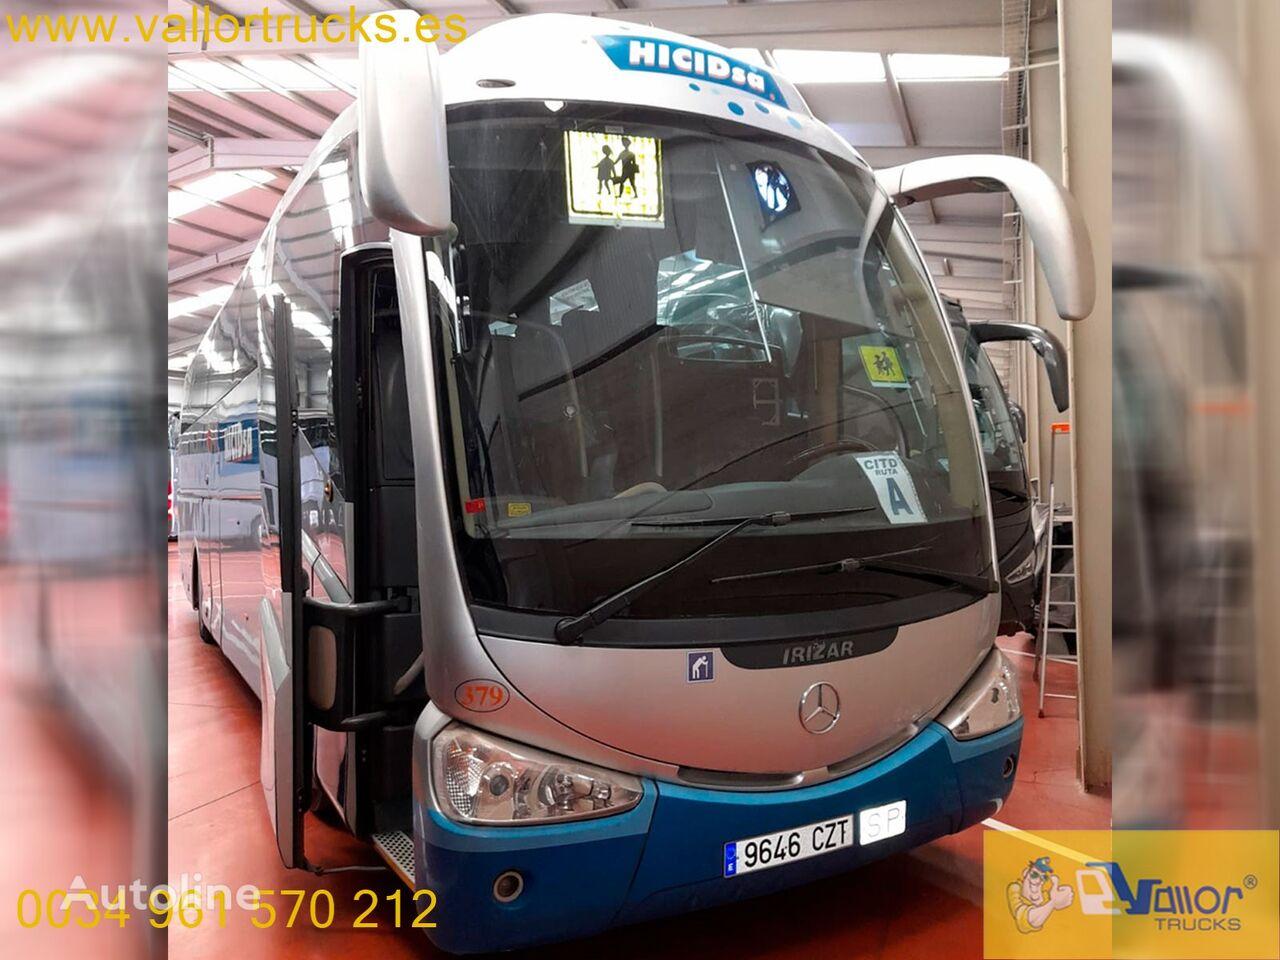 IRIZAR OC 500 coach bus